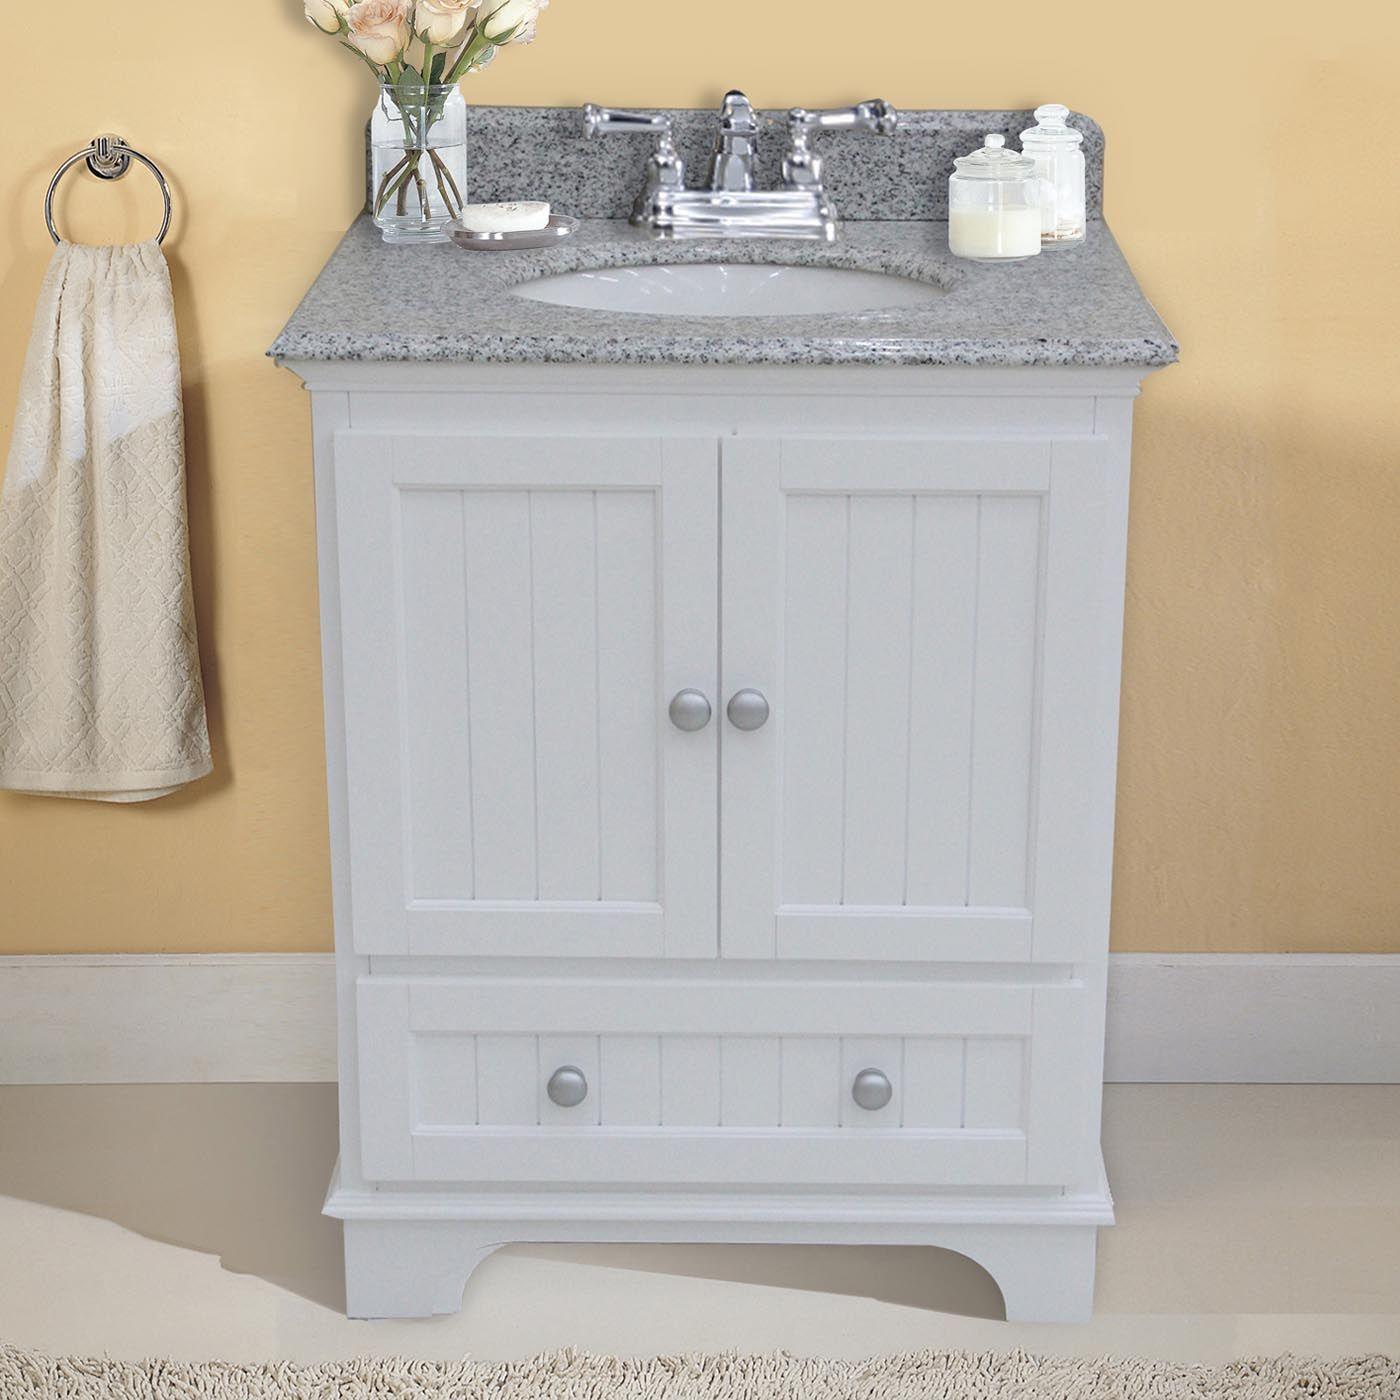 Laa Products Wf6217 28 Anica 28 In Single Sink Wood Bathroom